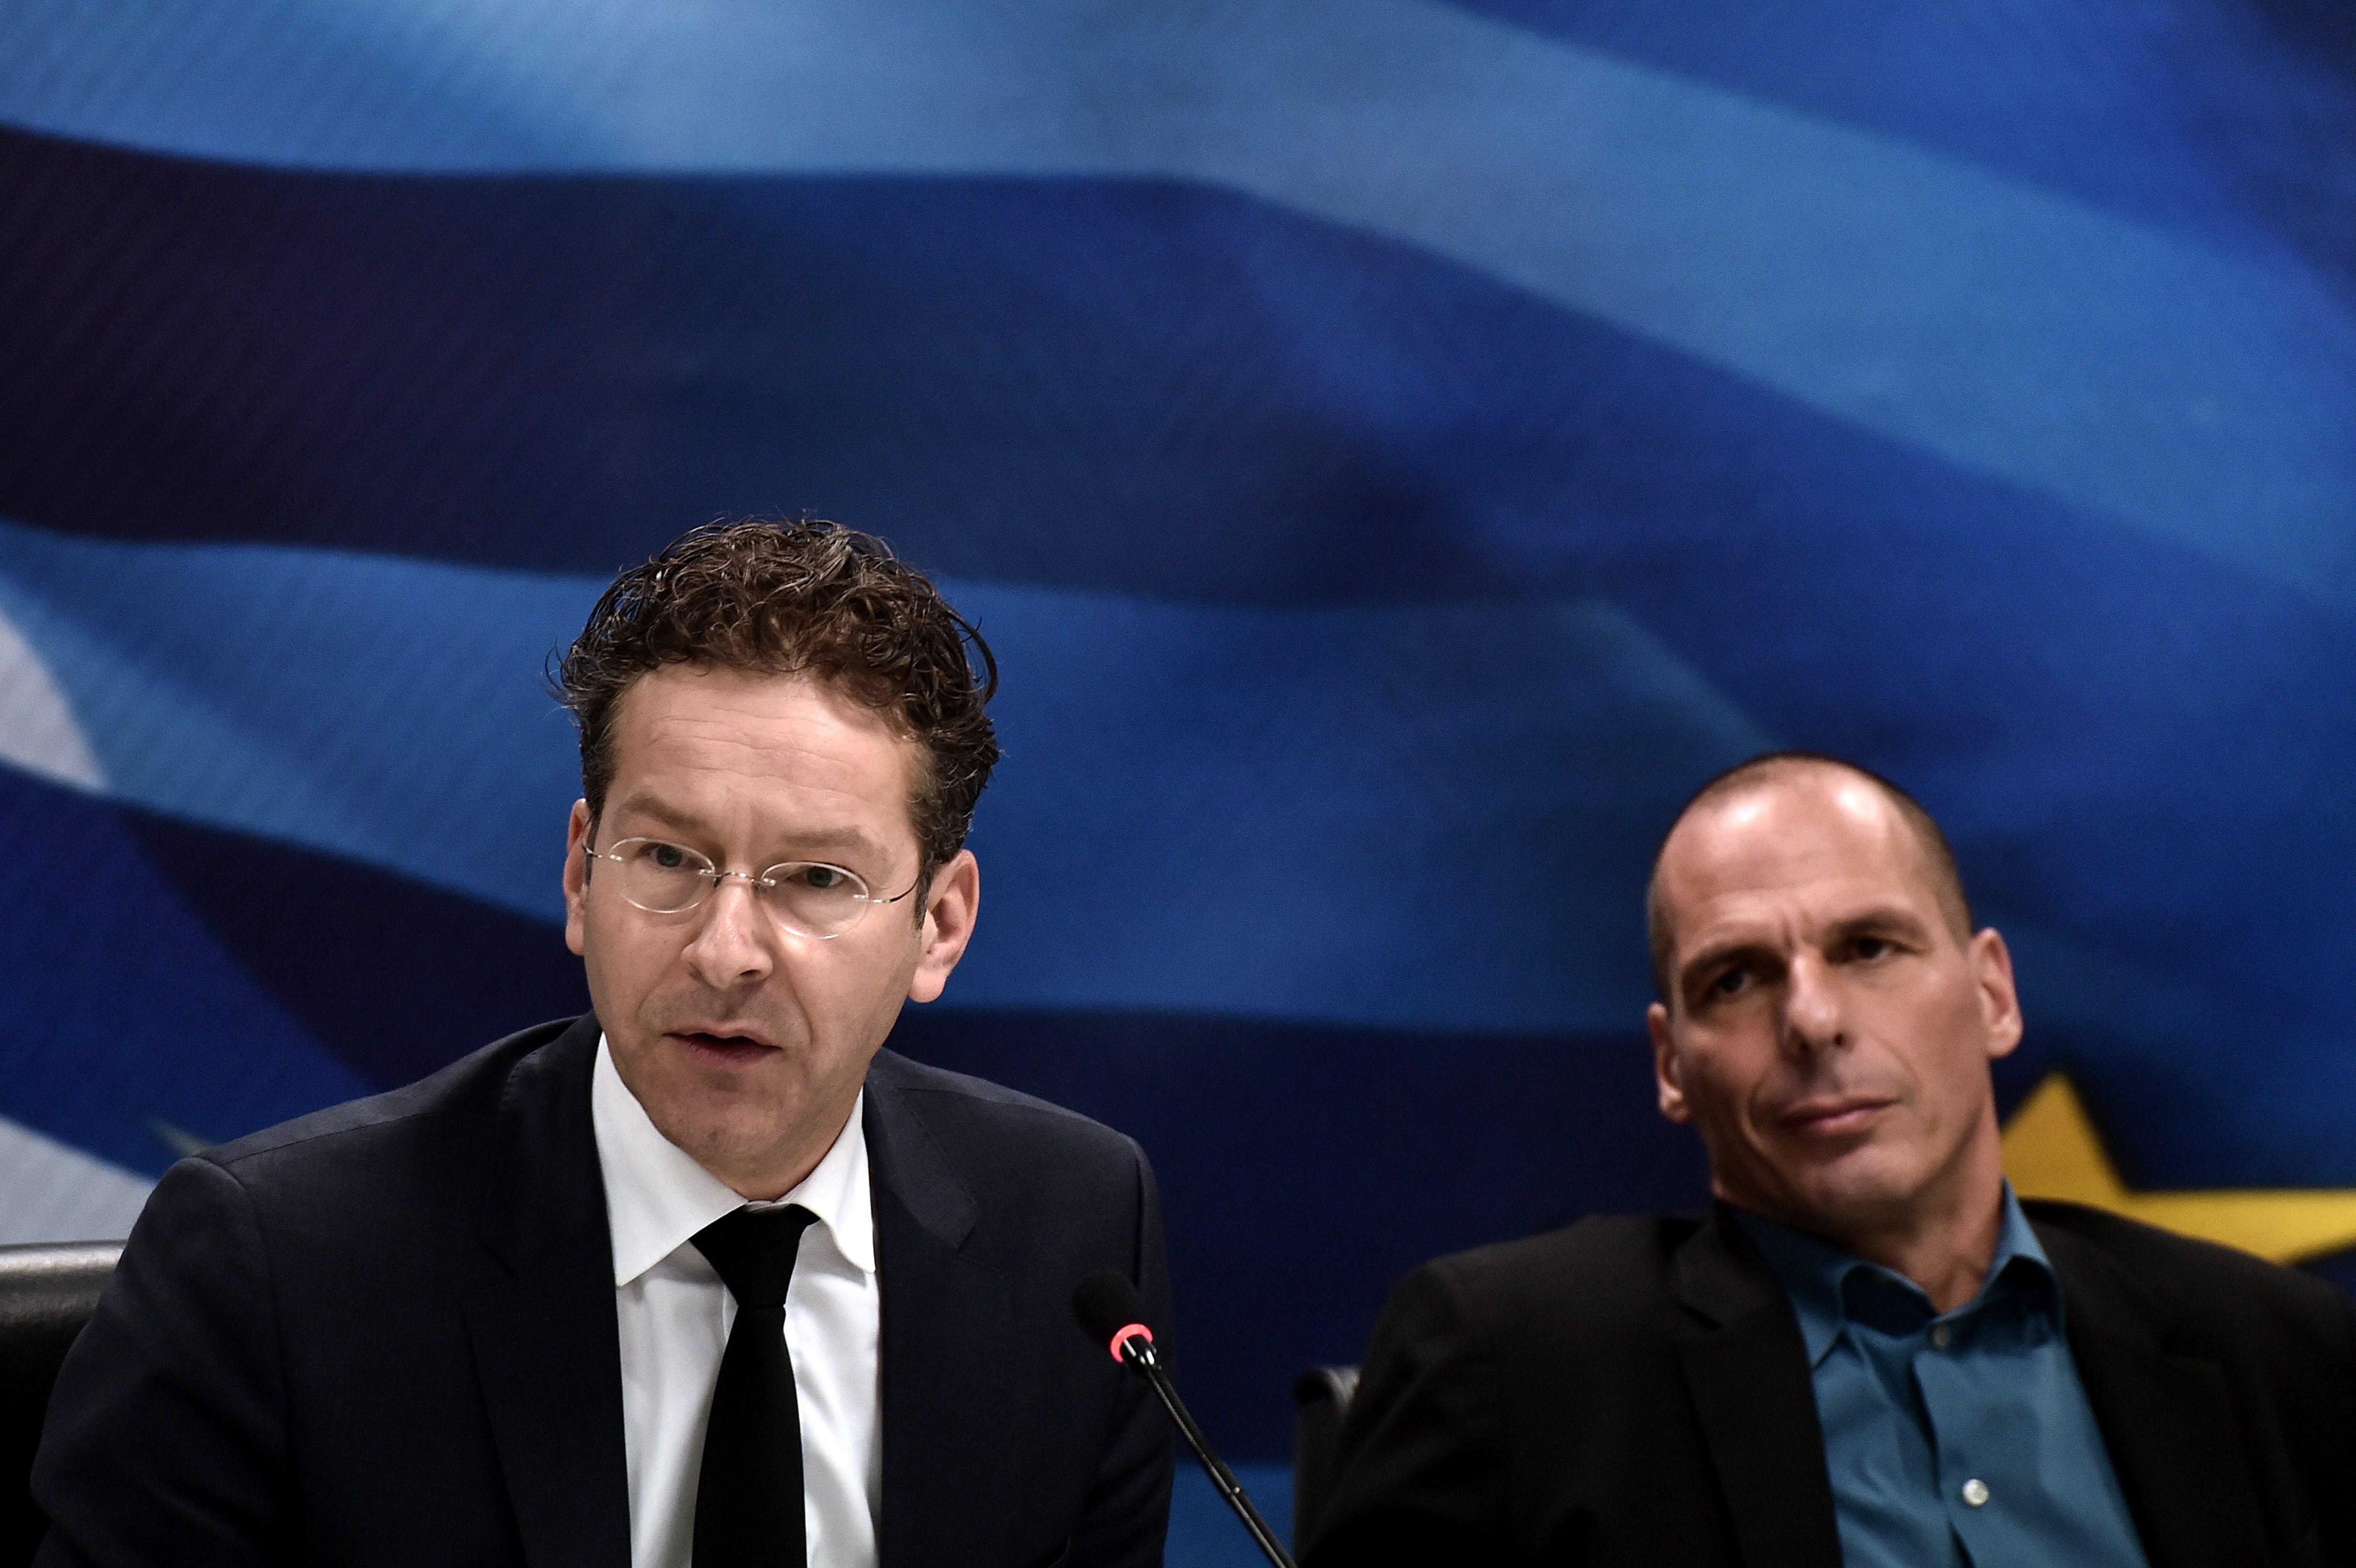 """Yes, I wanted Varoufakis removed"",Dijsselbloemadmits"